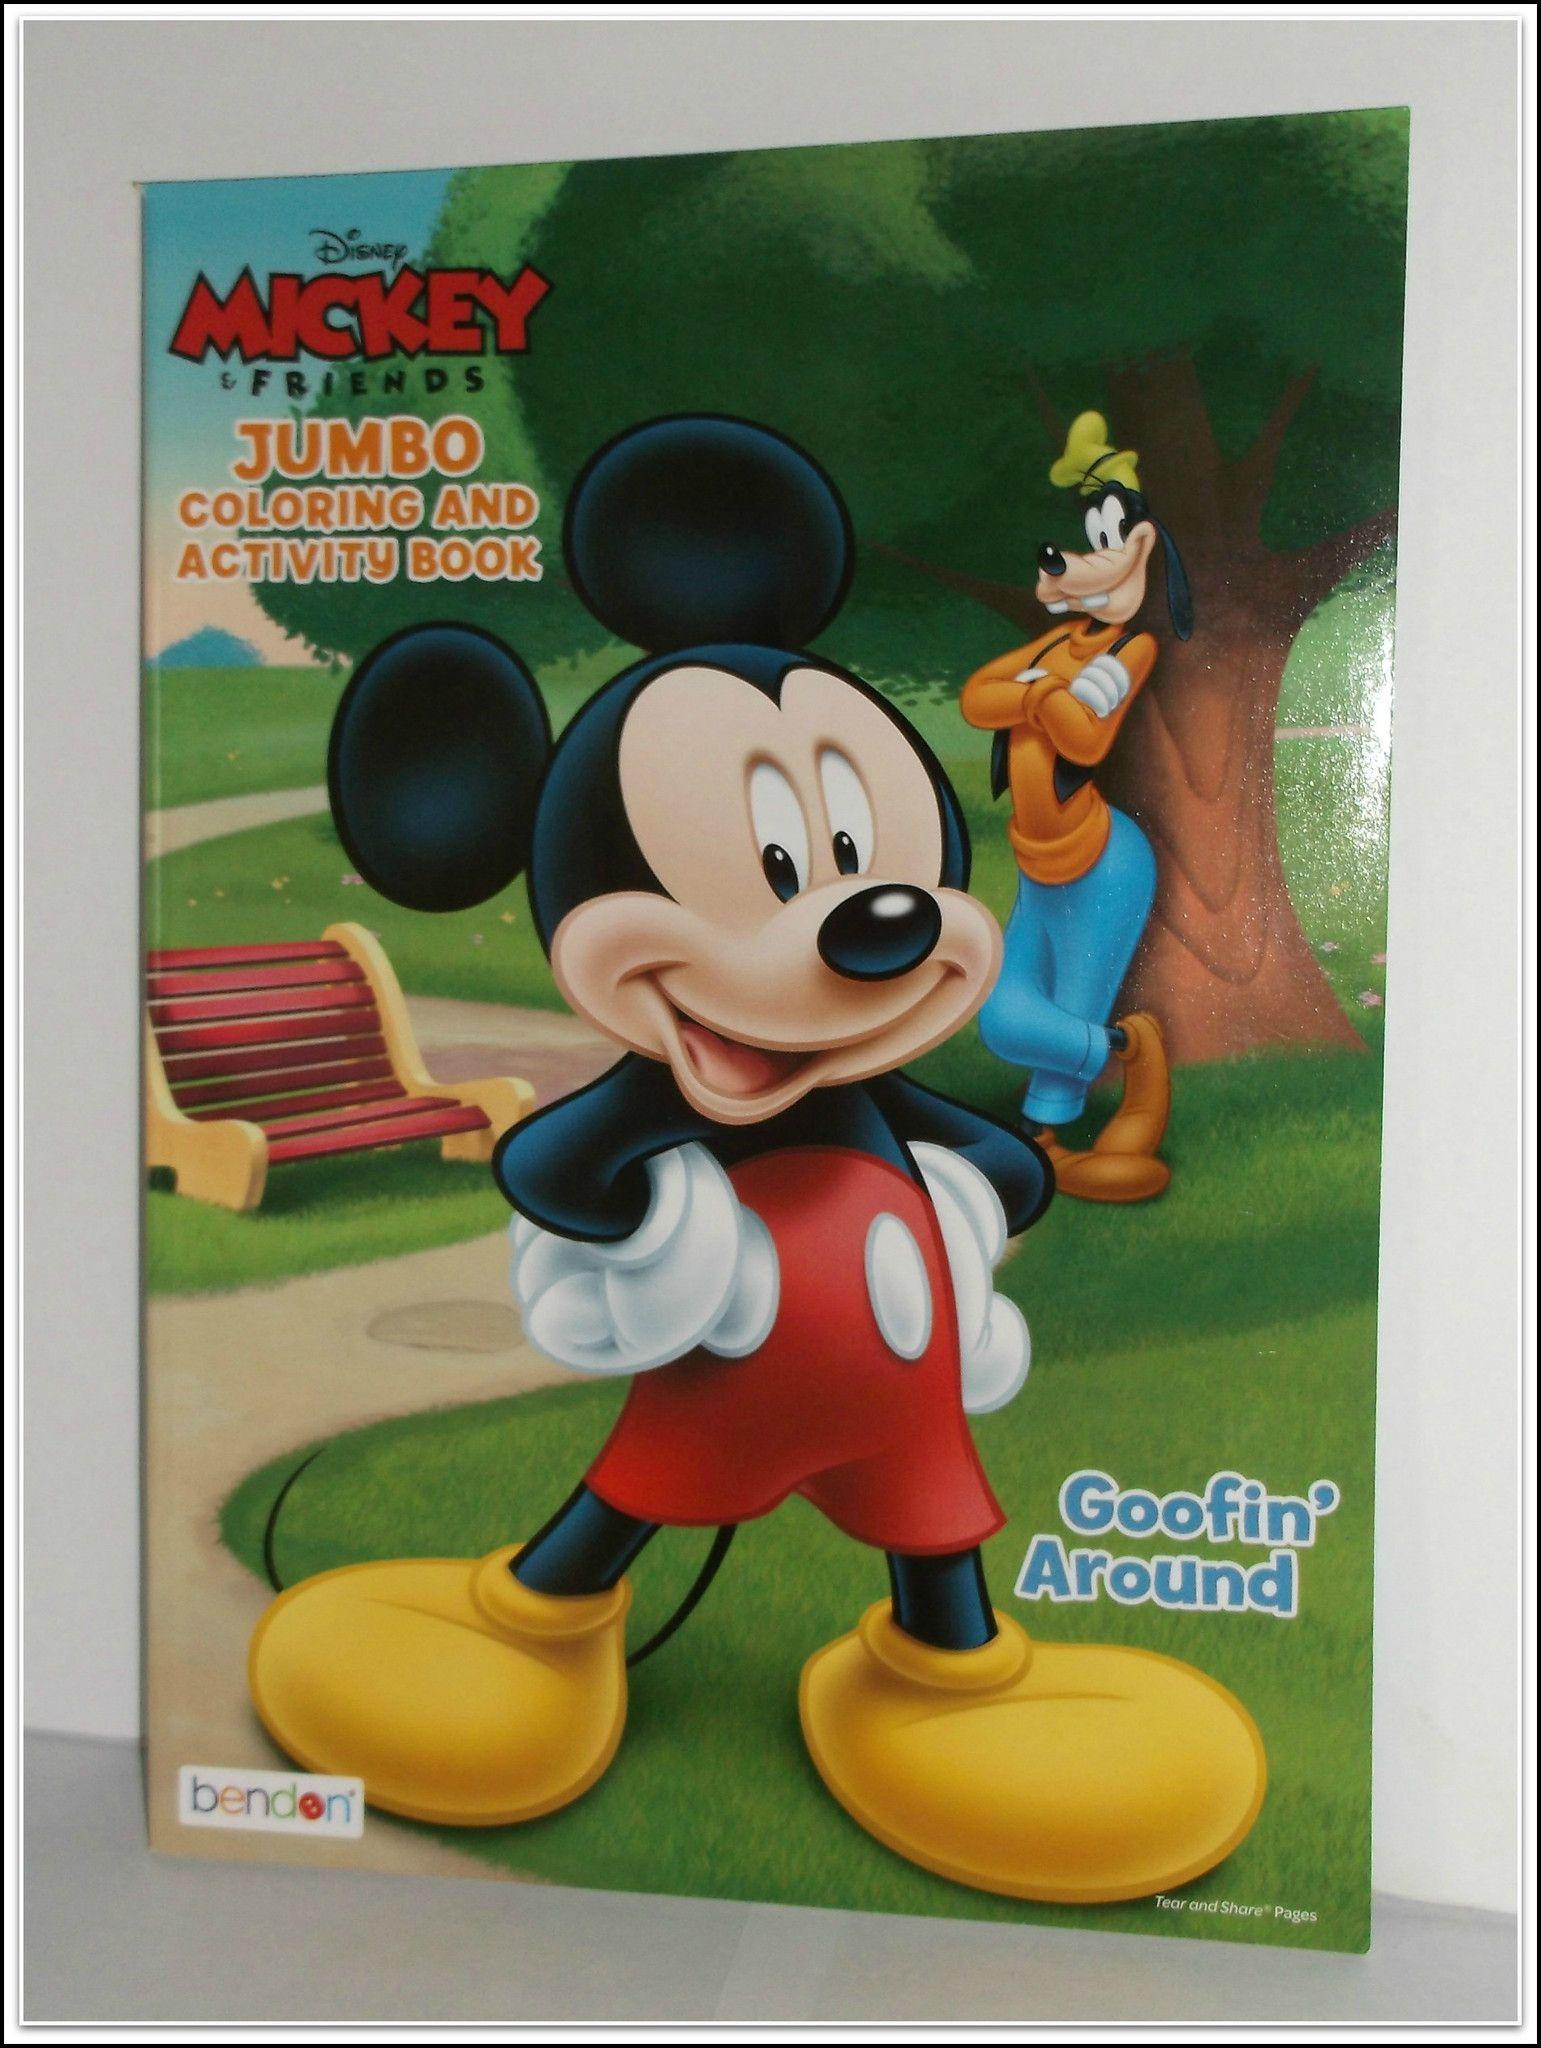 Kids Coloring Book Disney Mickey Friends JUMBO And Activity Box Crayola Crayons